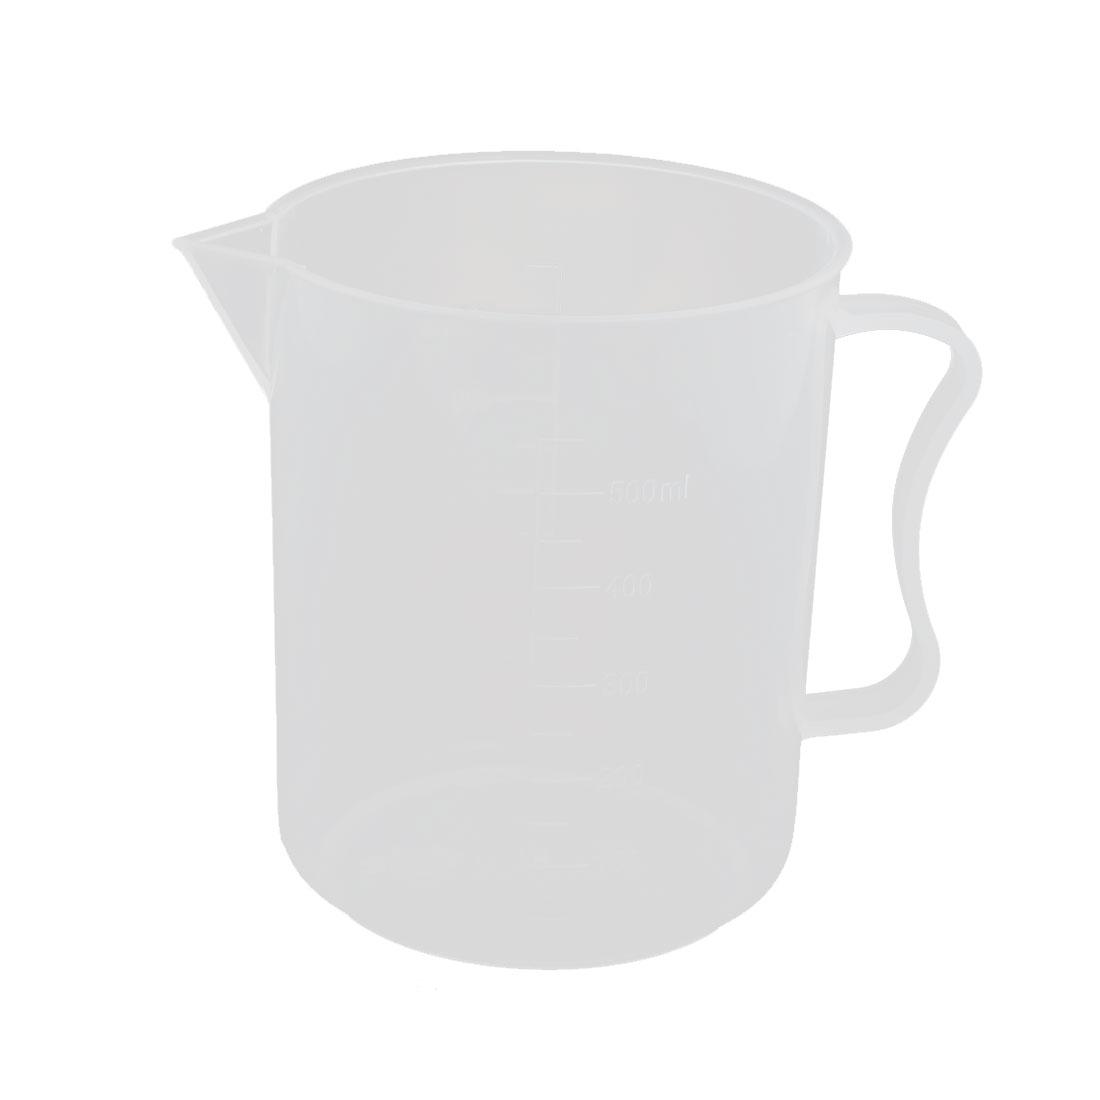 500mL Laboratory Spout Measuring Cup Beaker Clear w Handle